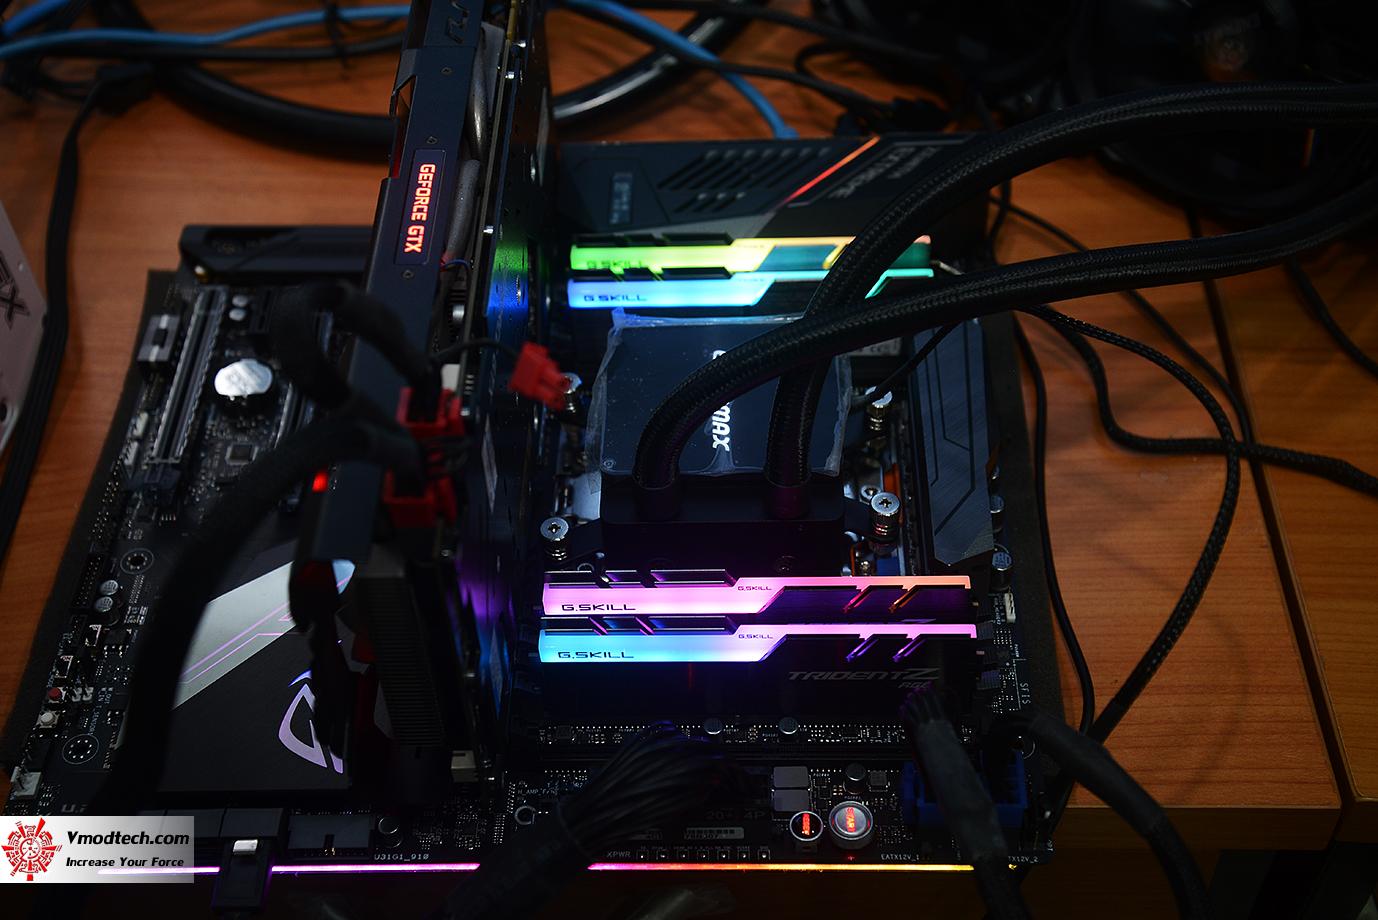 dsc 6546 AMD RYZEN THREADRIPPER 2950X PROCESSOR REVIEW